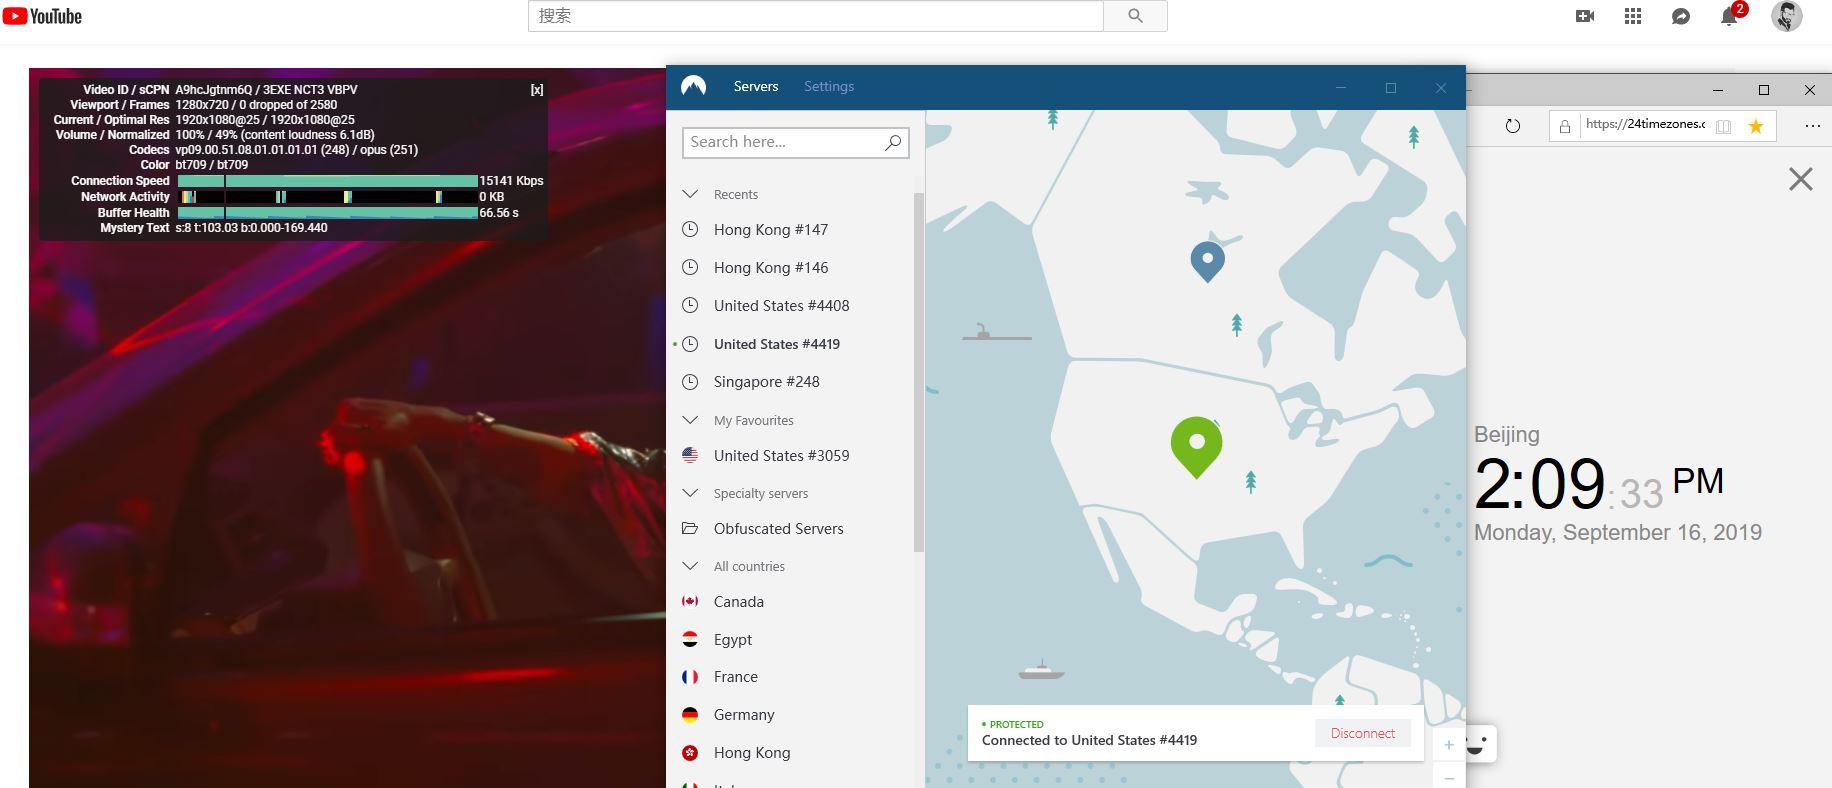 windows NordVPN United States 4419 服务器 中国翻墙 科学上网 YouTube速度测试-20190916